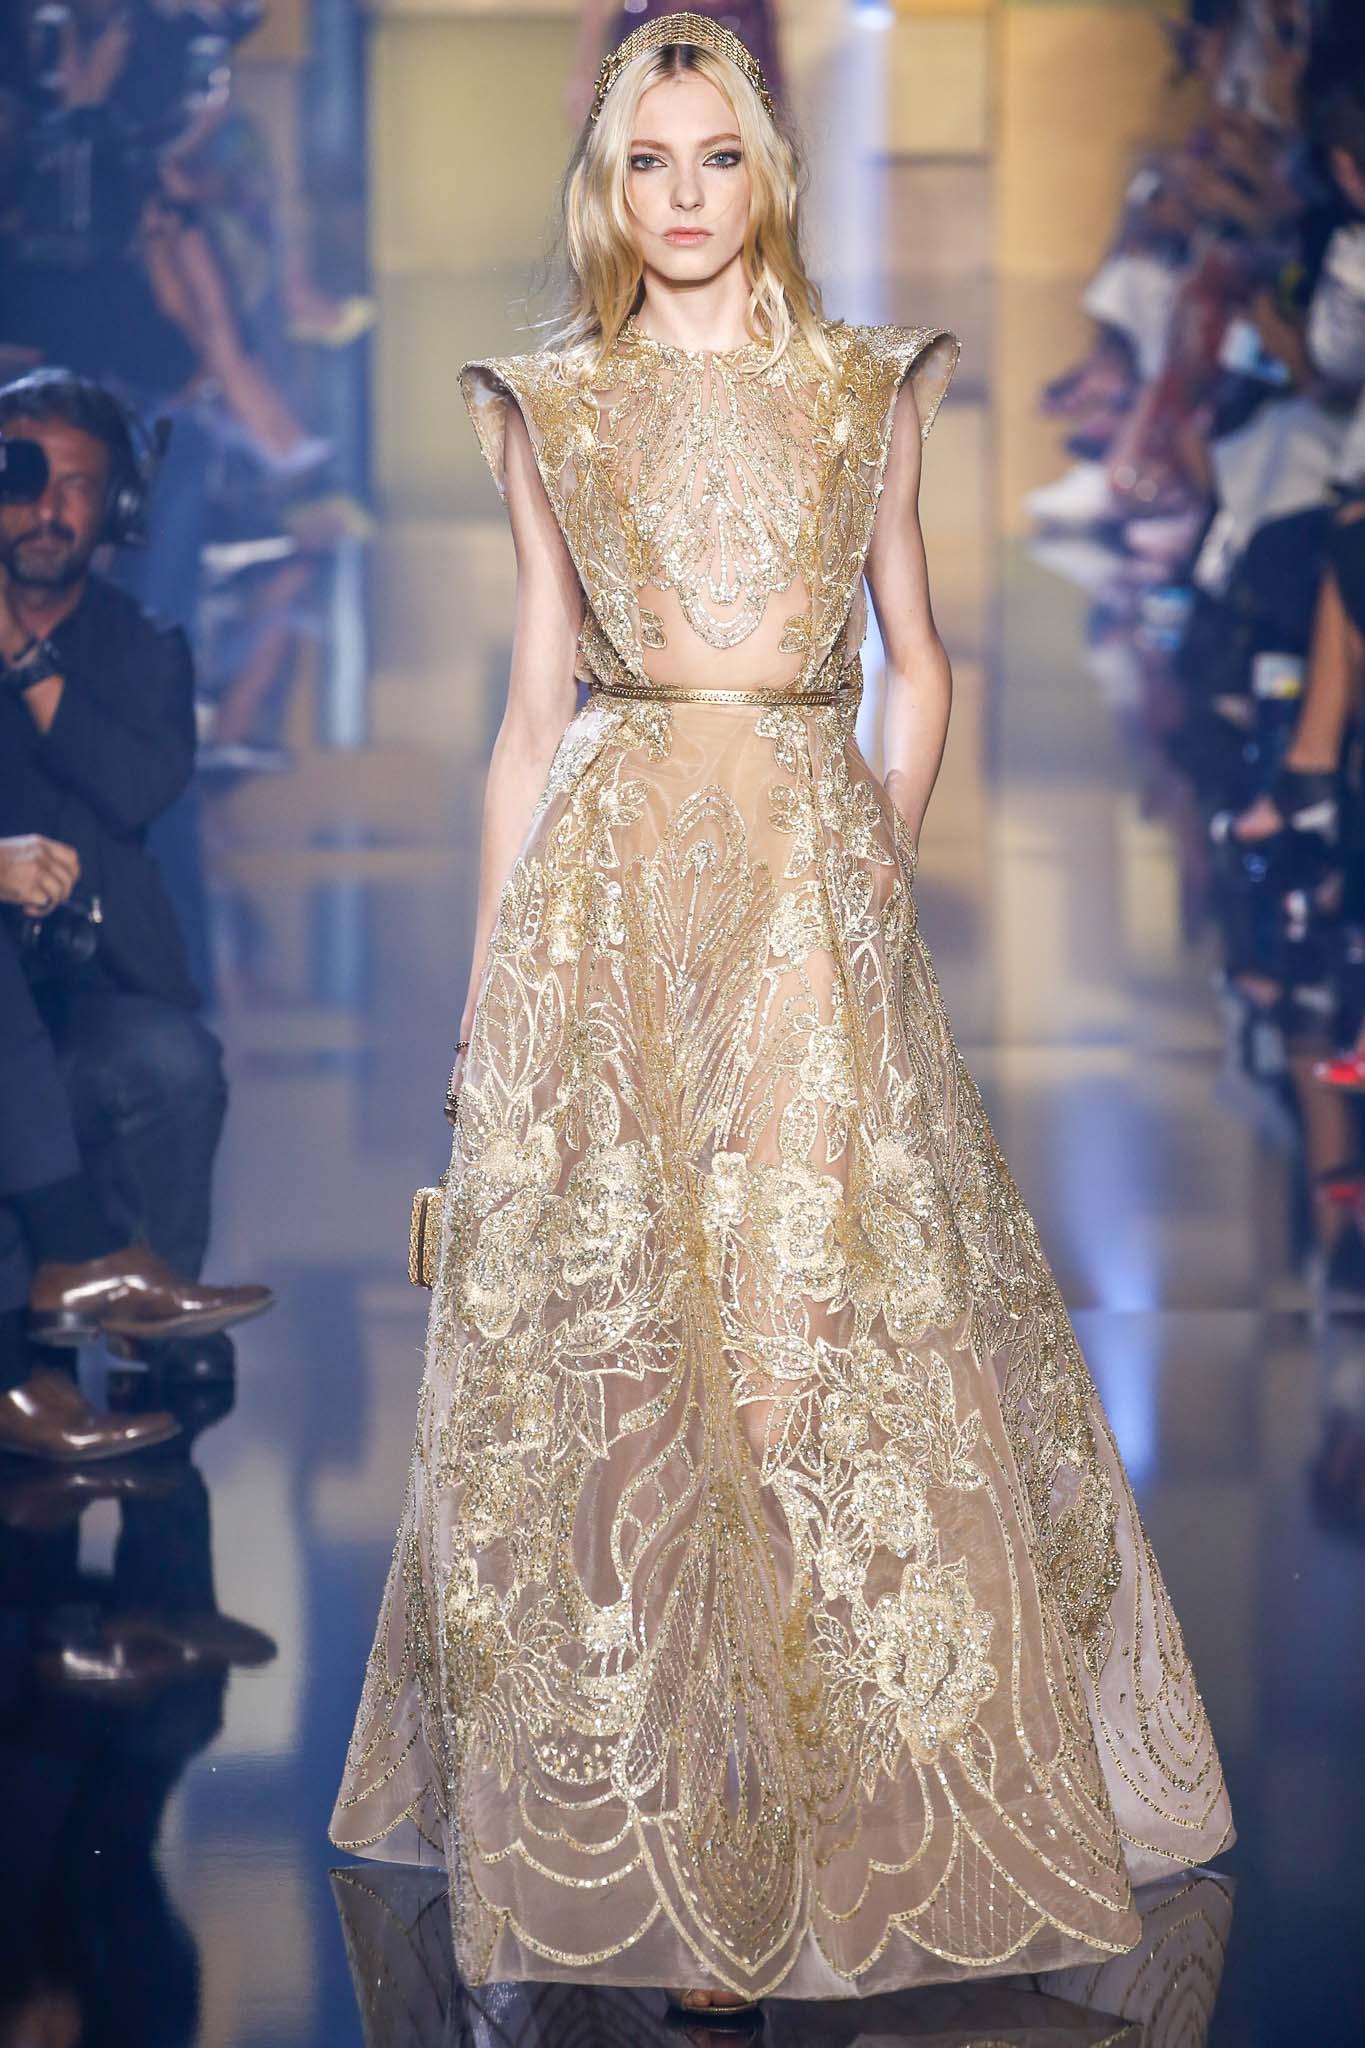 Elie Saab Haute Couture Herbst 2015 Kollektion Kleider